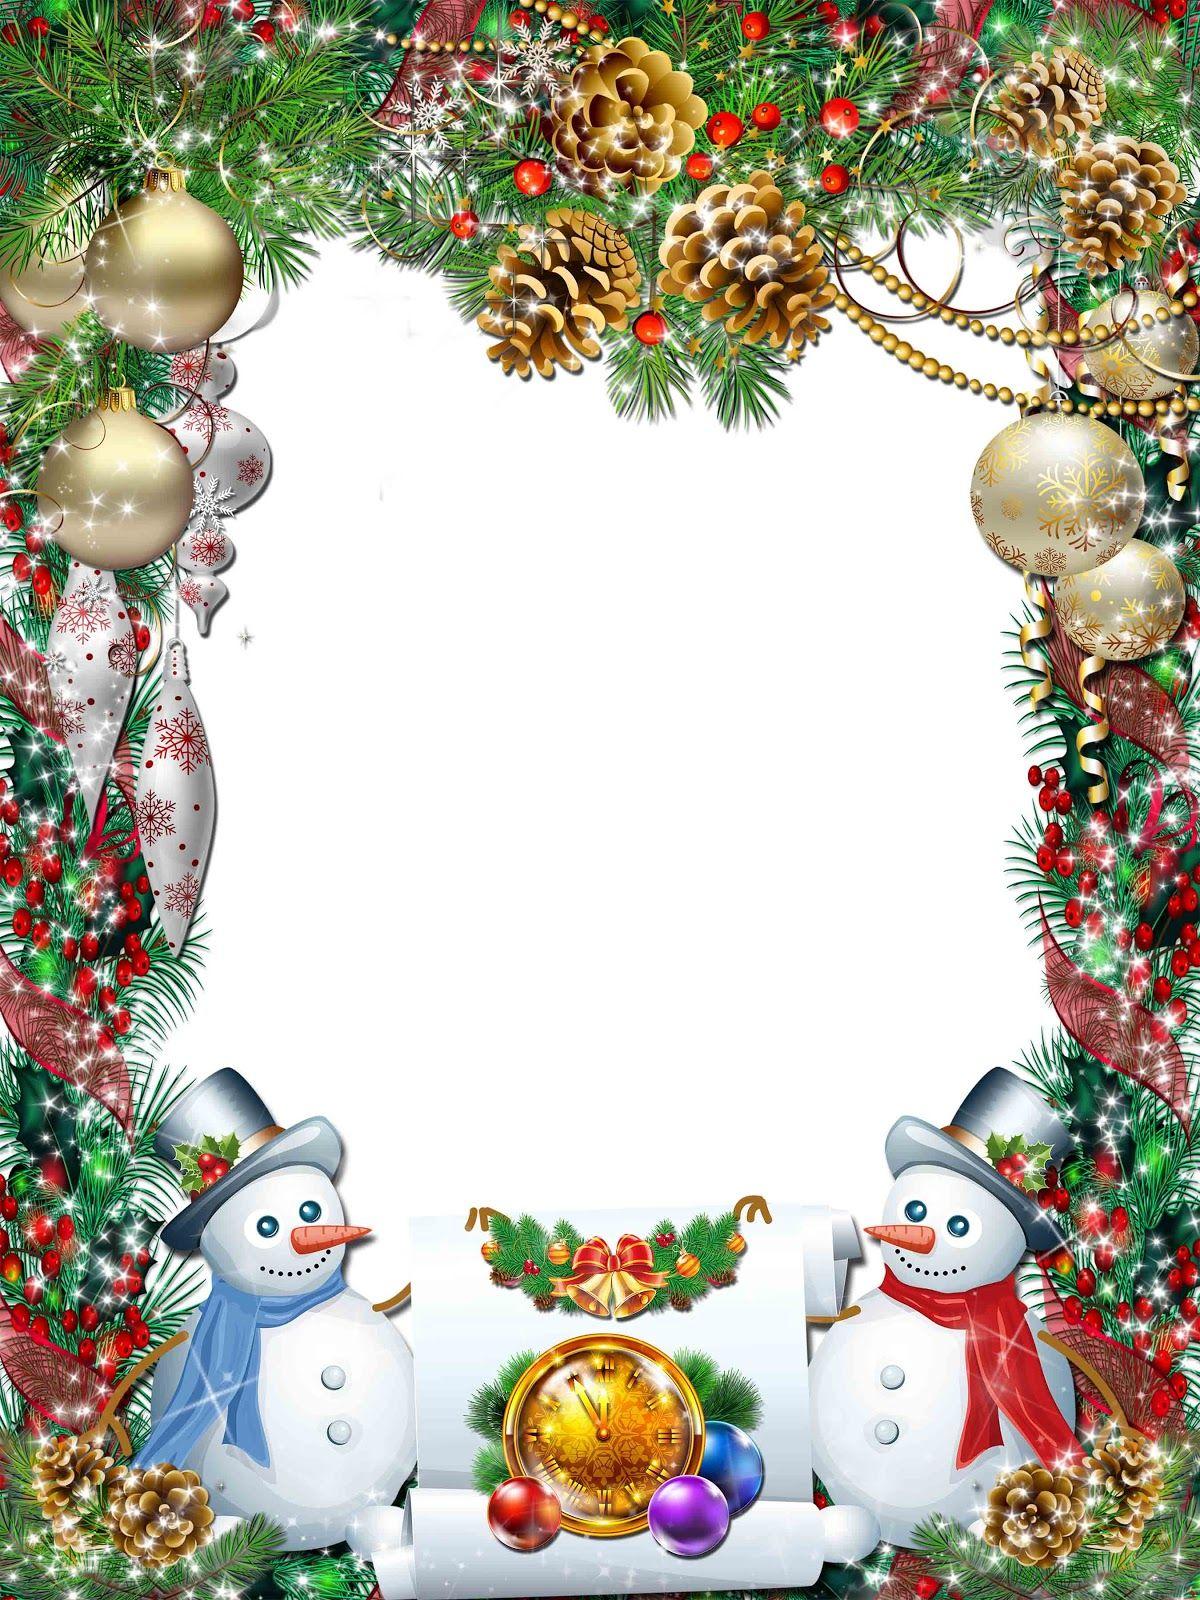 Pin by Ken Mastin on Christmas Frames & Wallpaper.